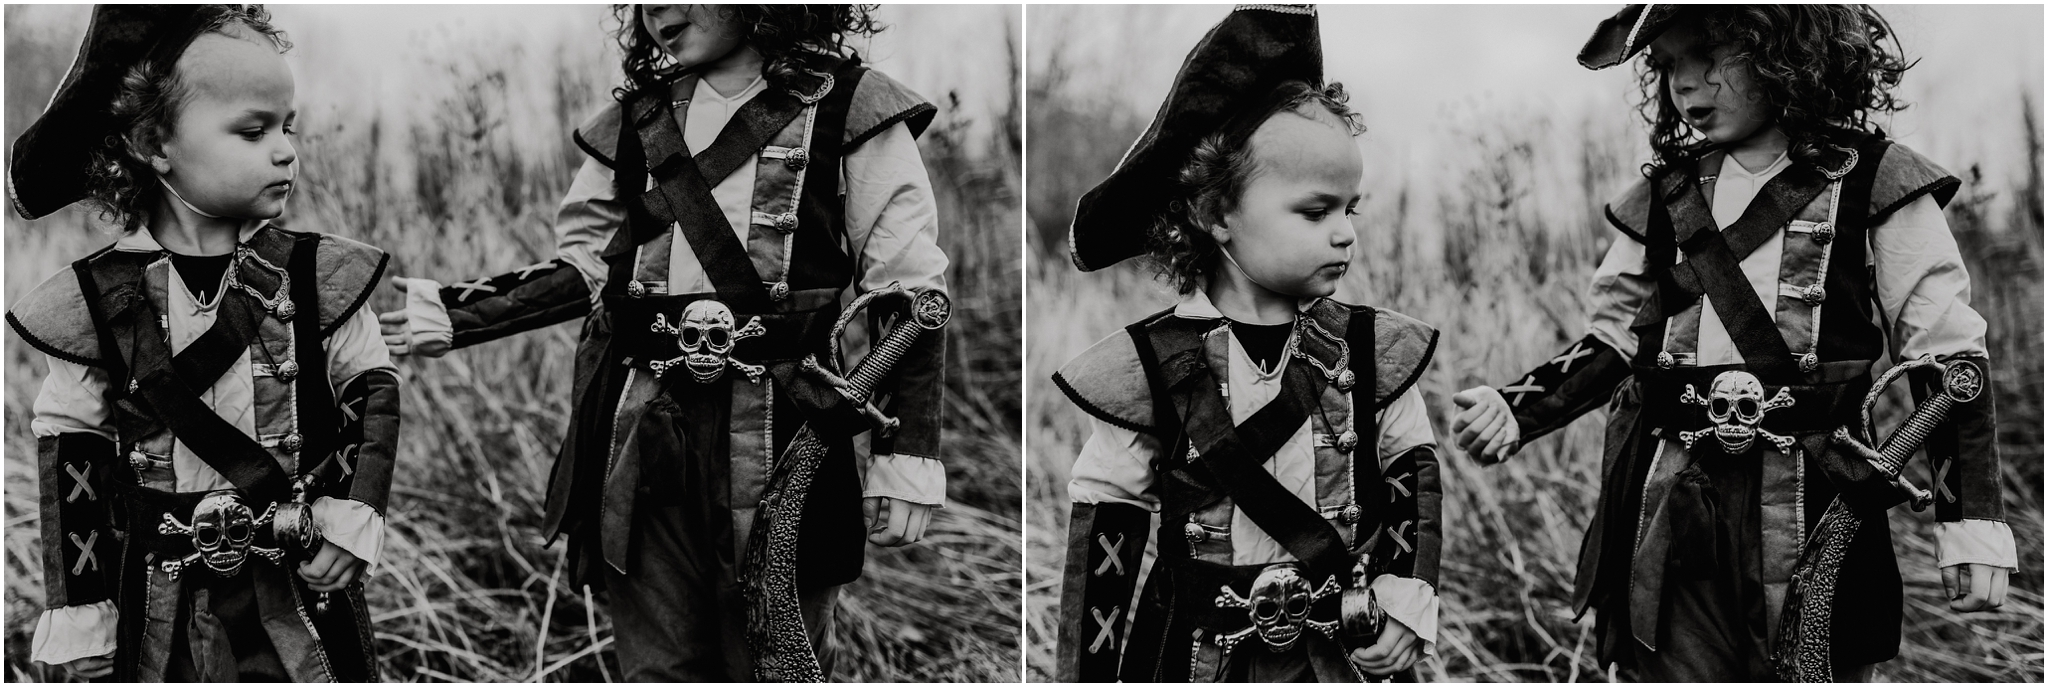 Edmonton Family Photographer - Halloween 2017